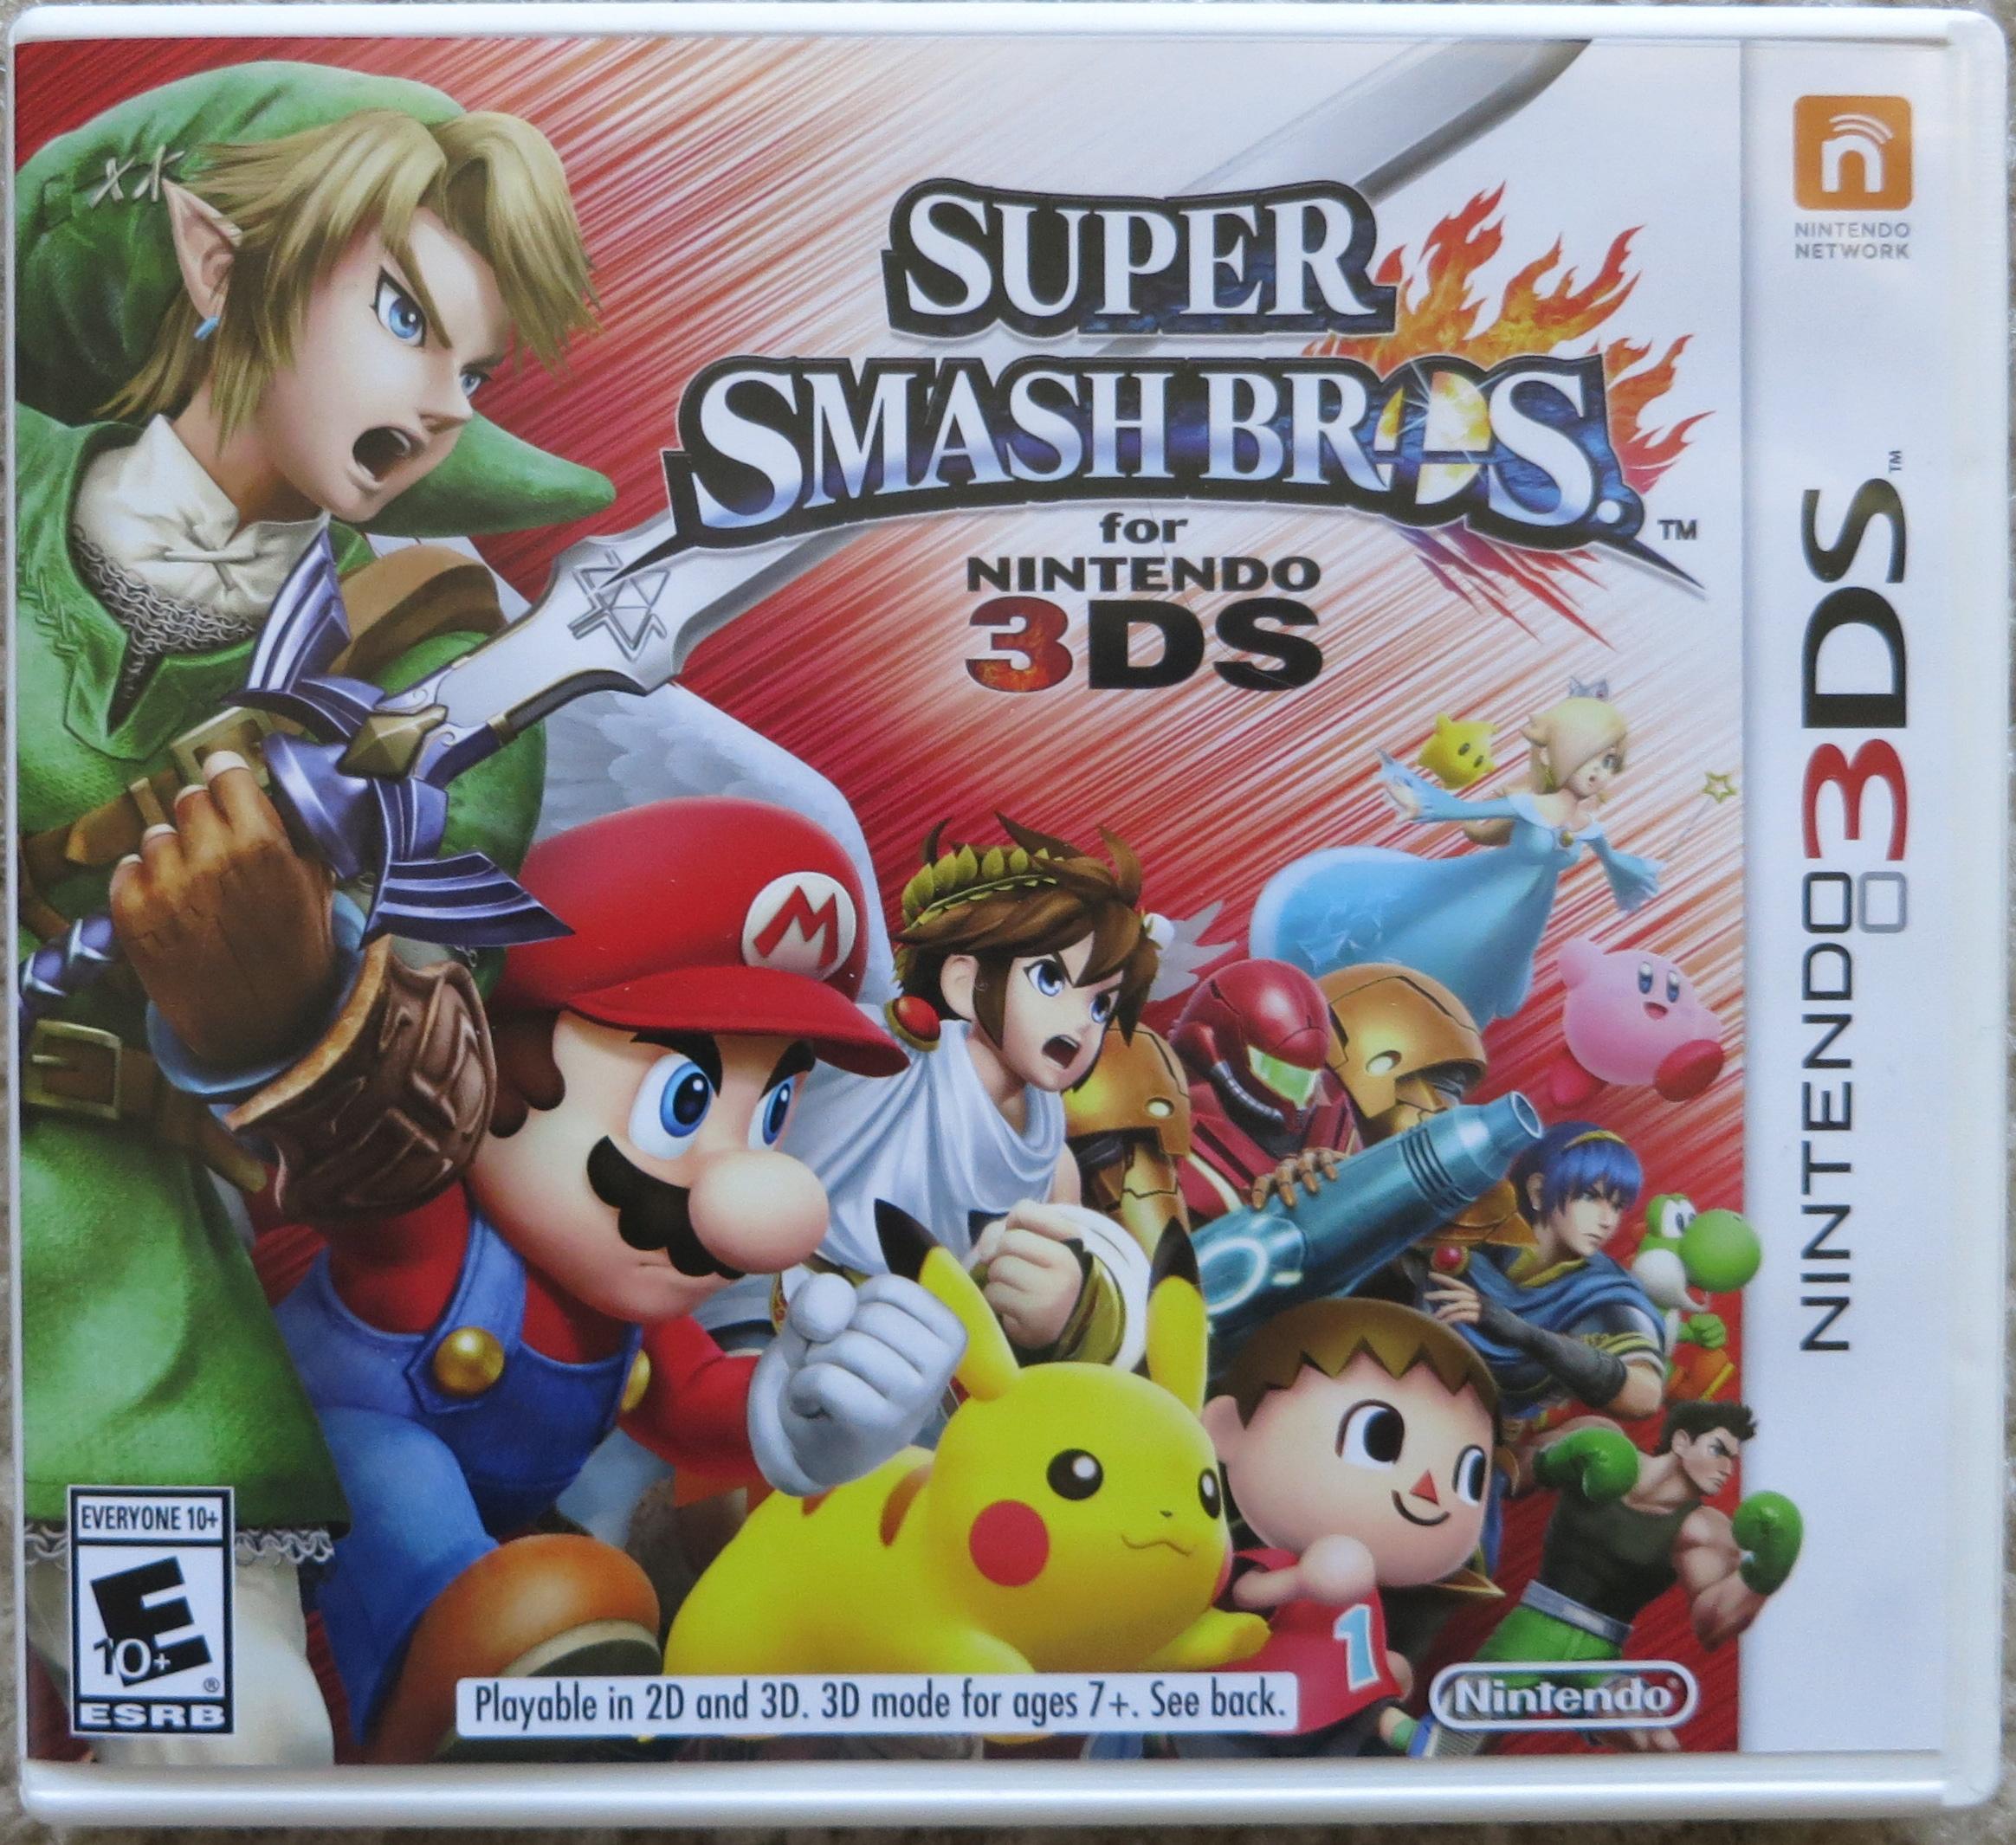 Super Smash Bros 3DS Cover